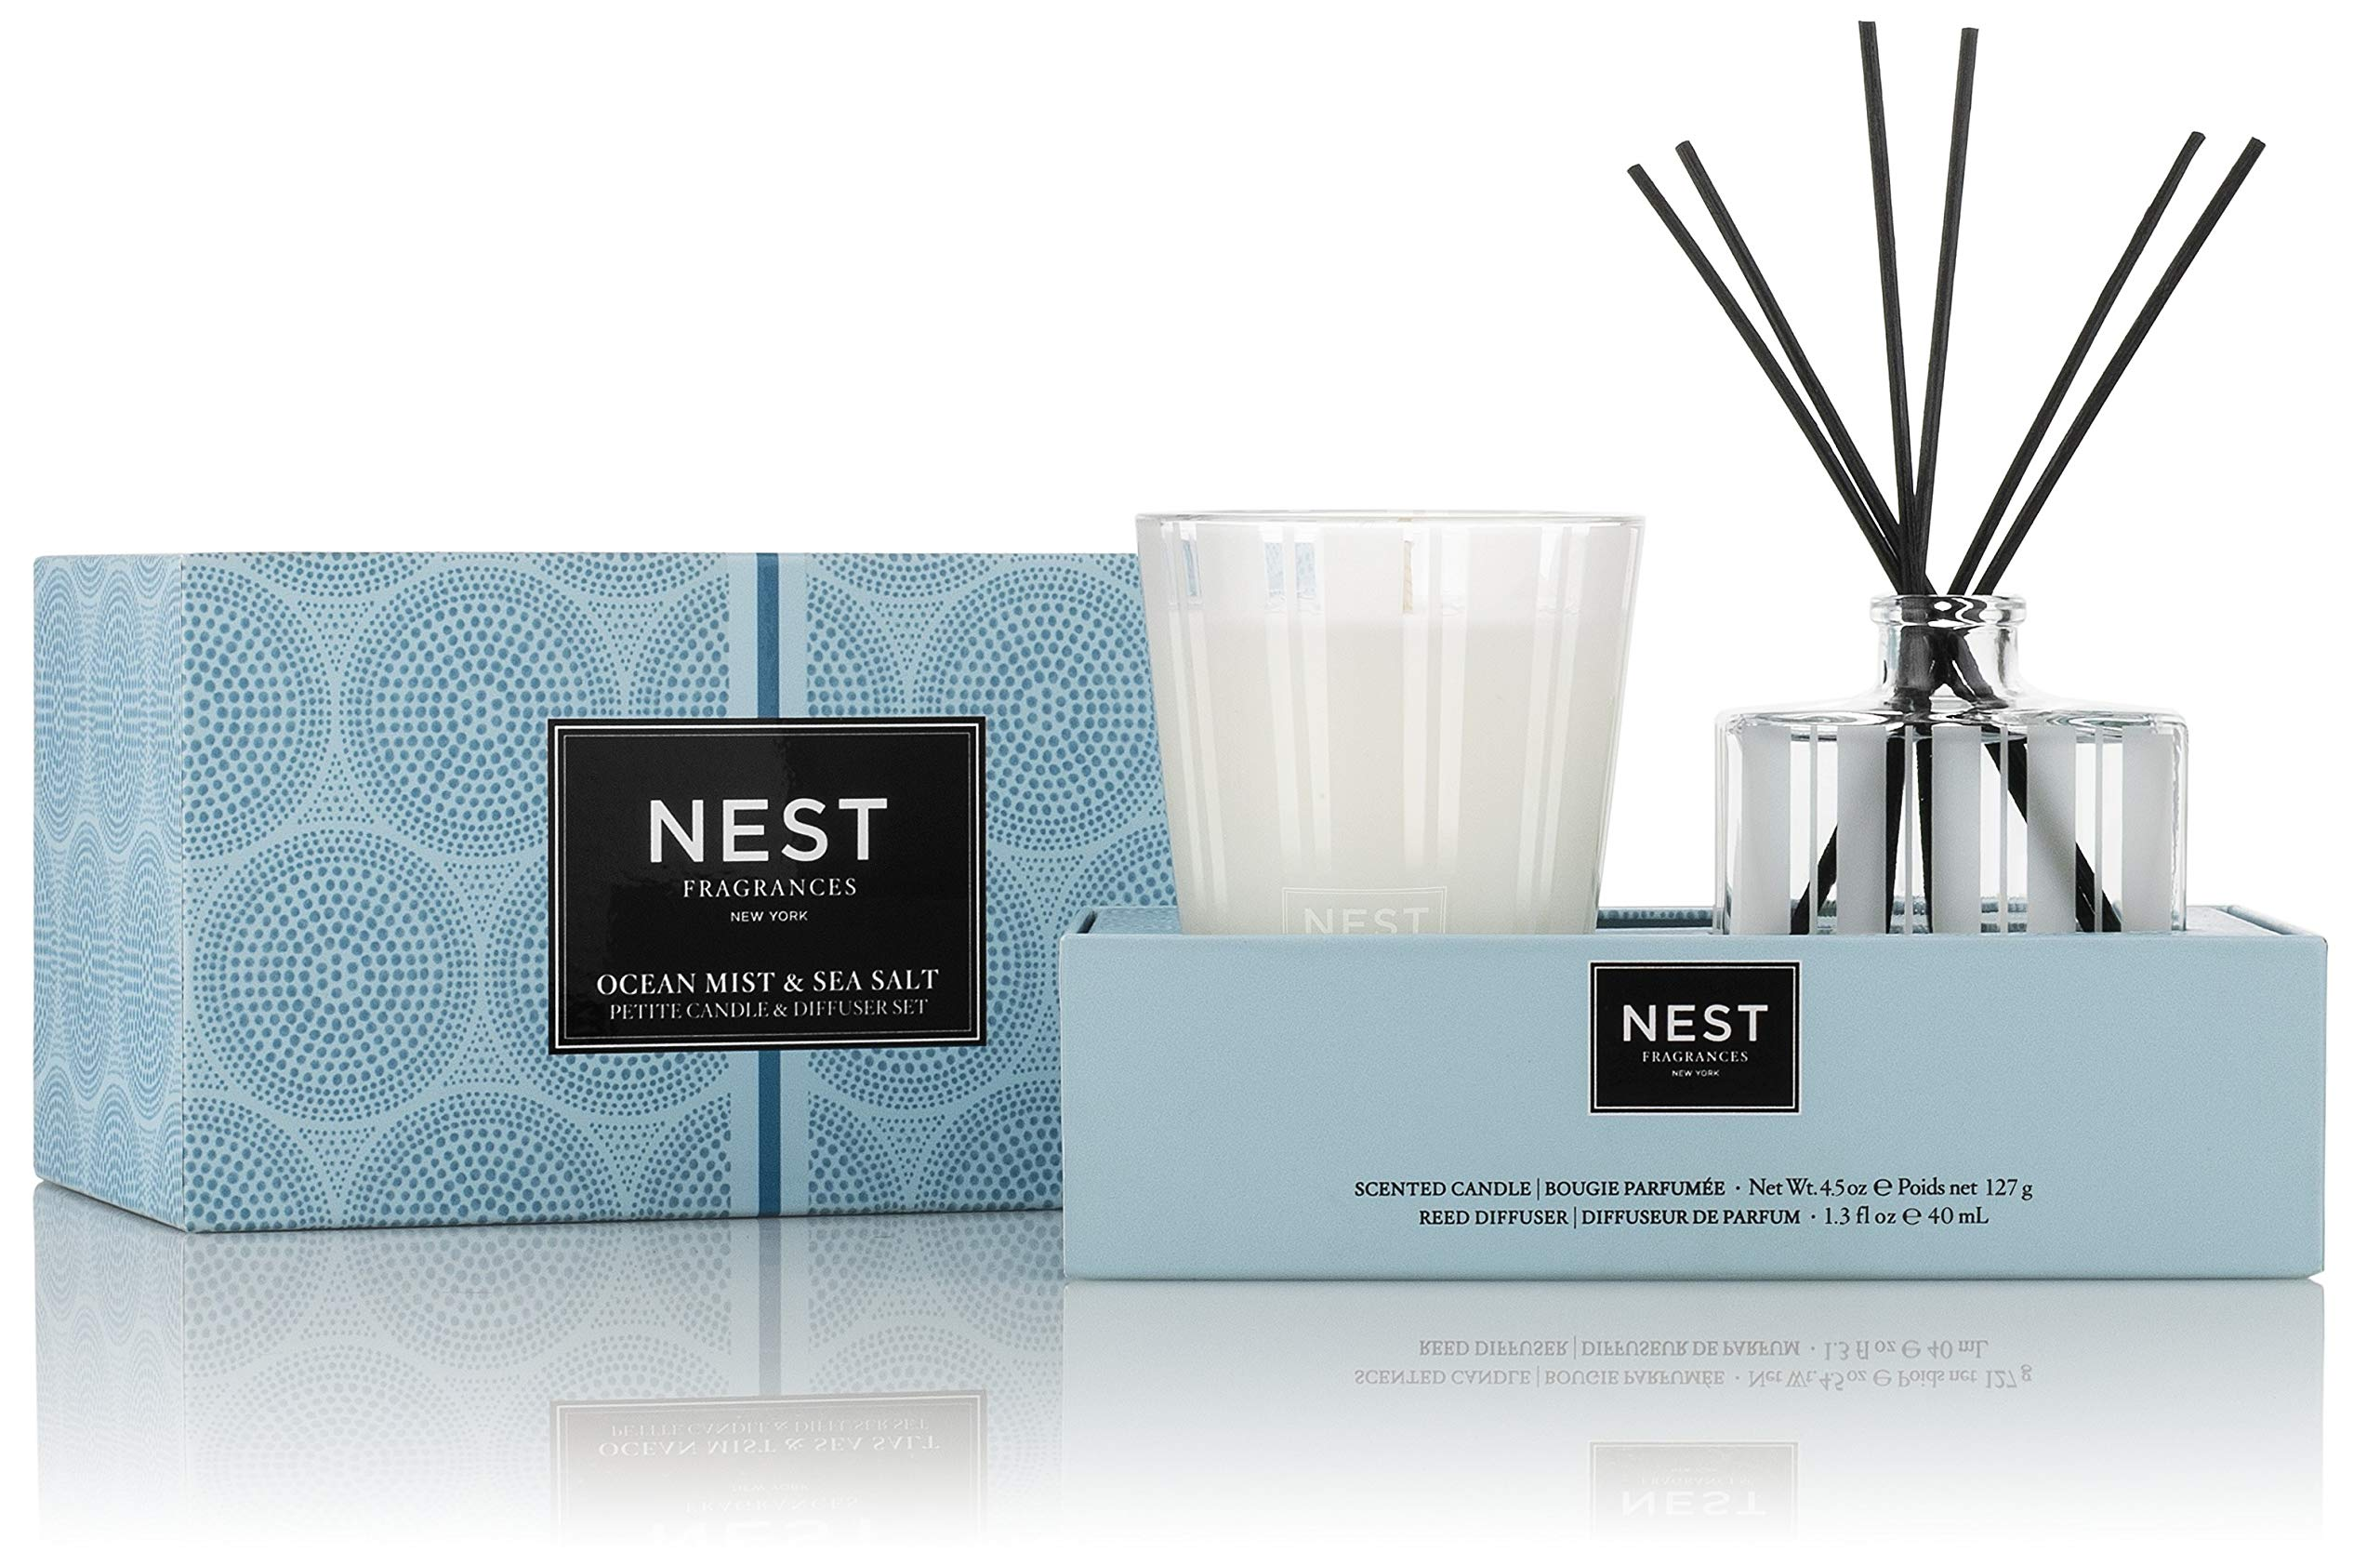 NEST Fragrances Ocean Mist & Sea Salt Petite Candle & Reed Diffuser Set by NEST Fragrances